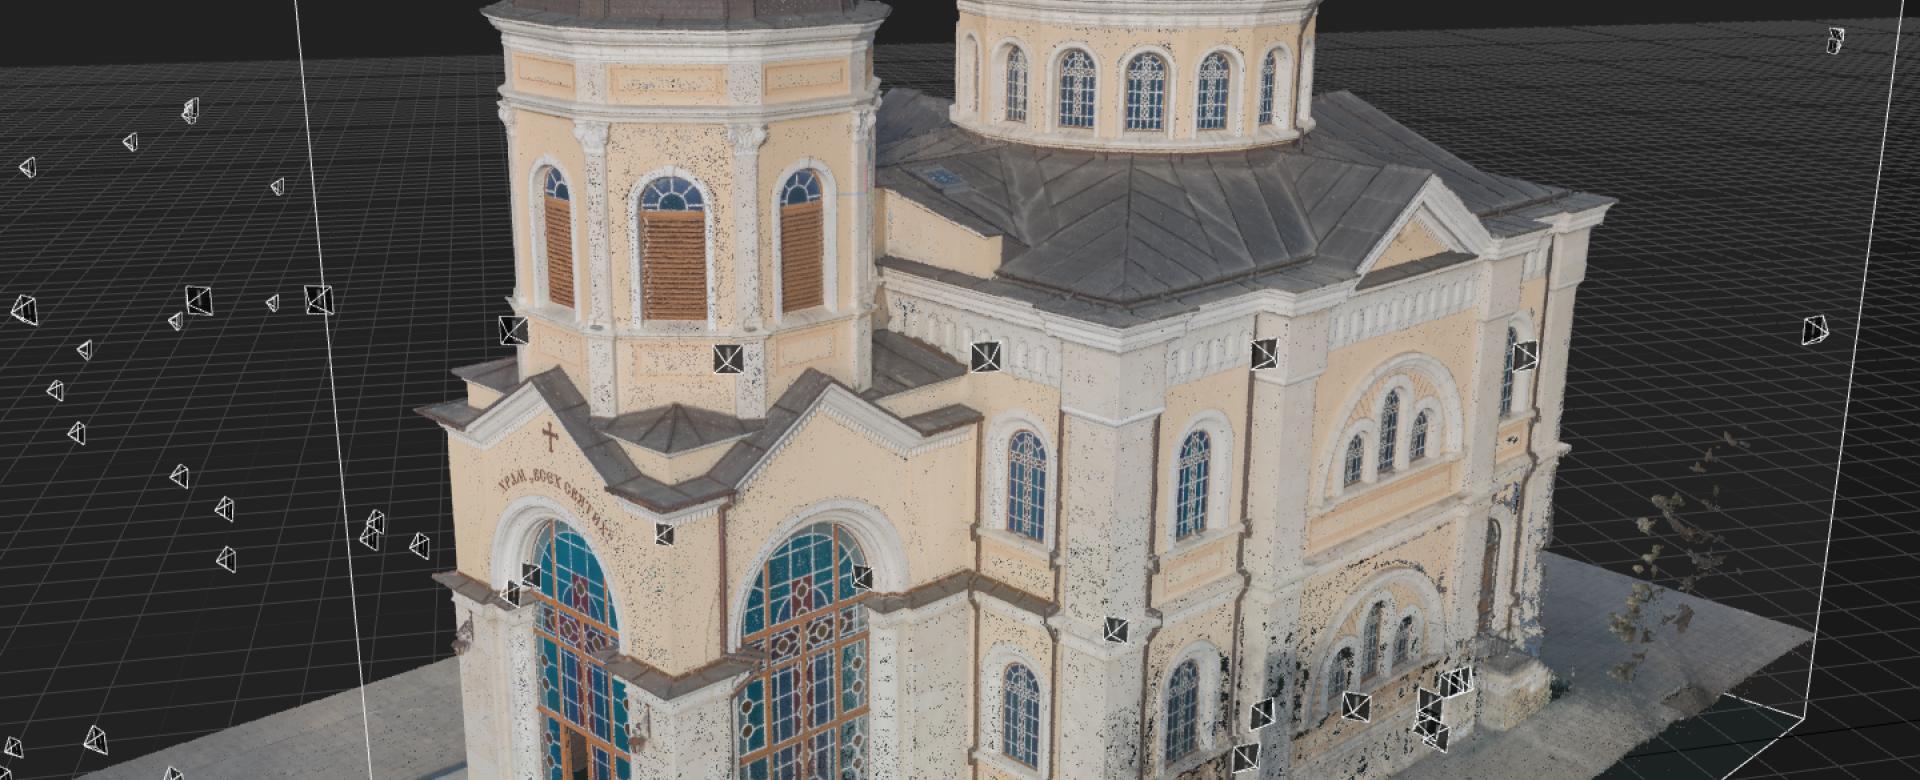 Church 3D Scan in Architecture